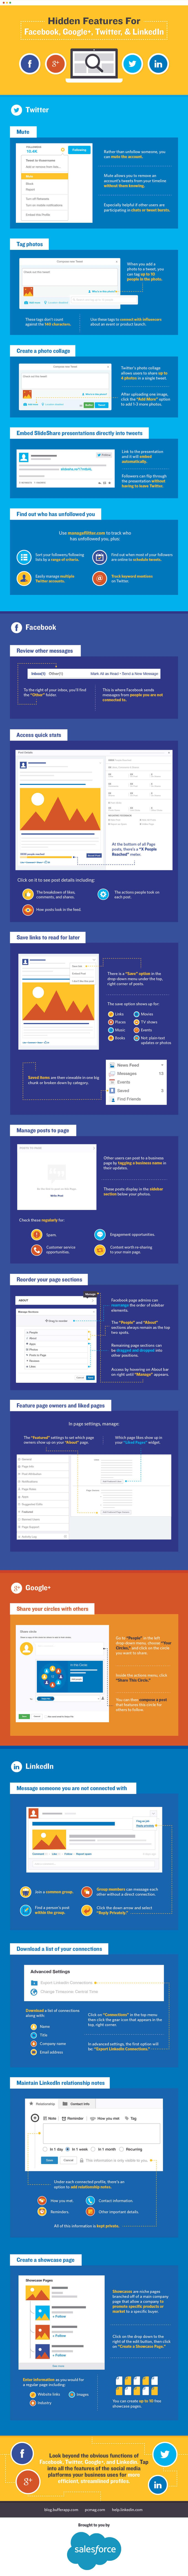 Infographic: The hidden features from Facebook, Google+, Twitter & LinkedIn